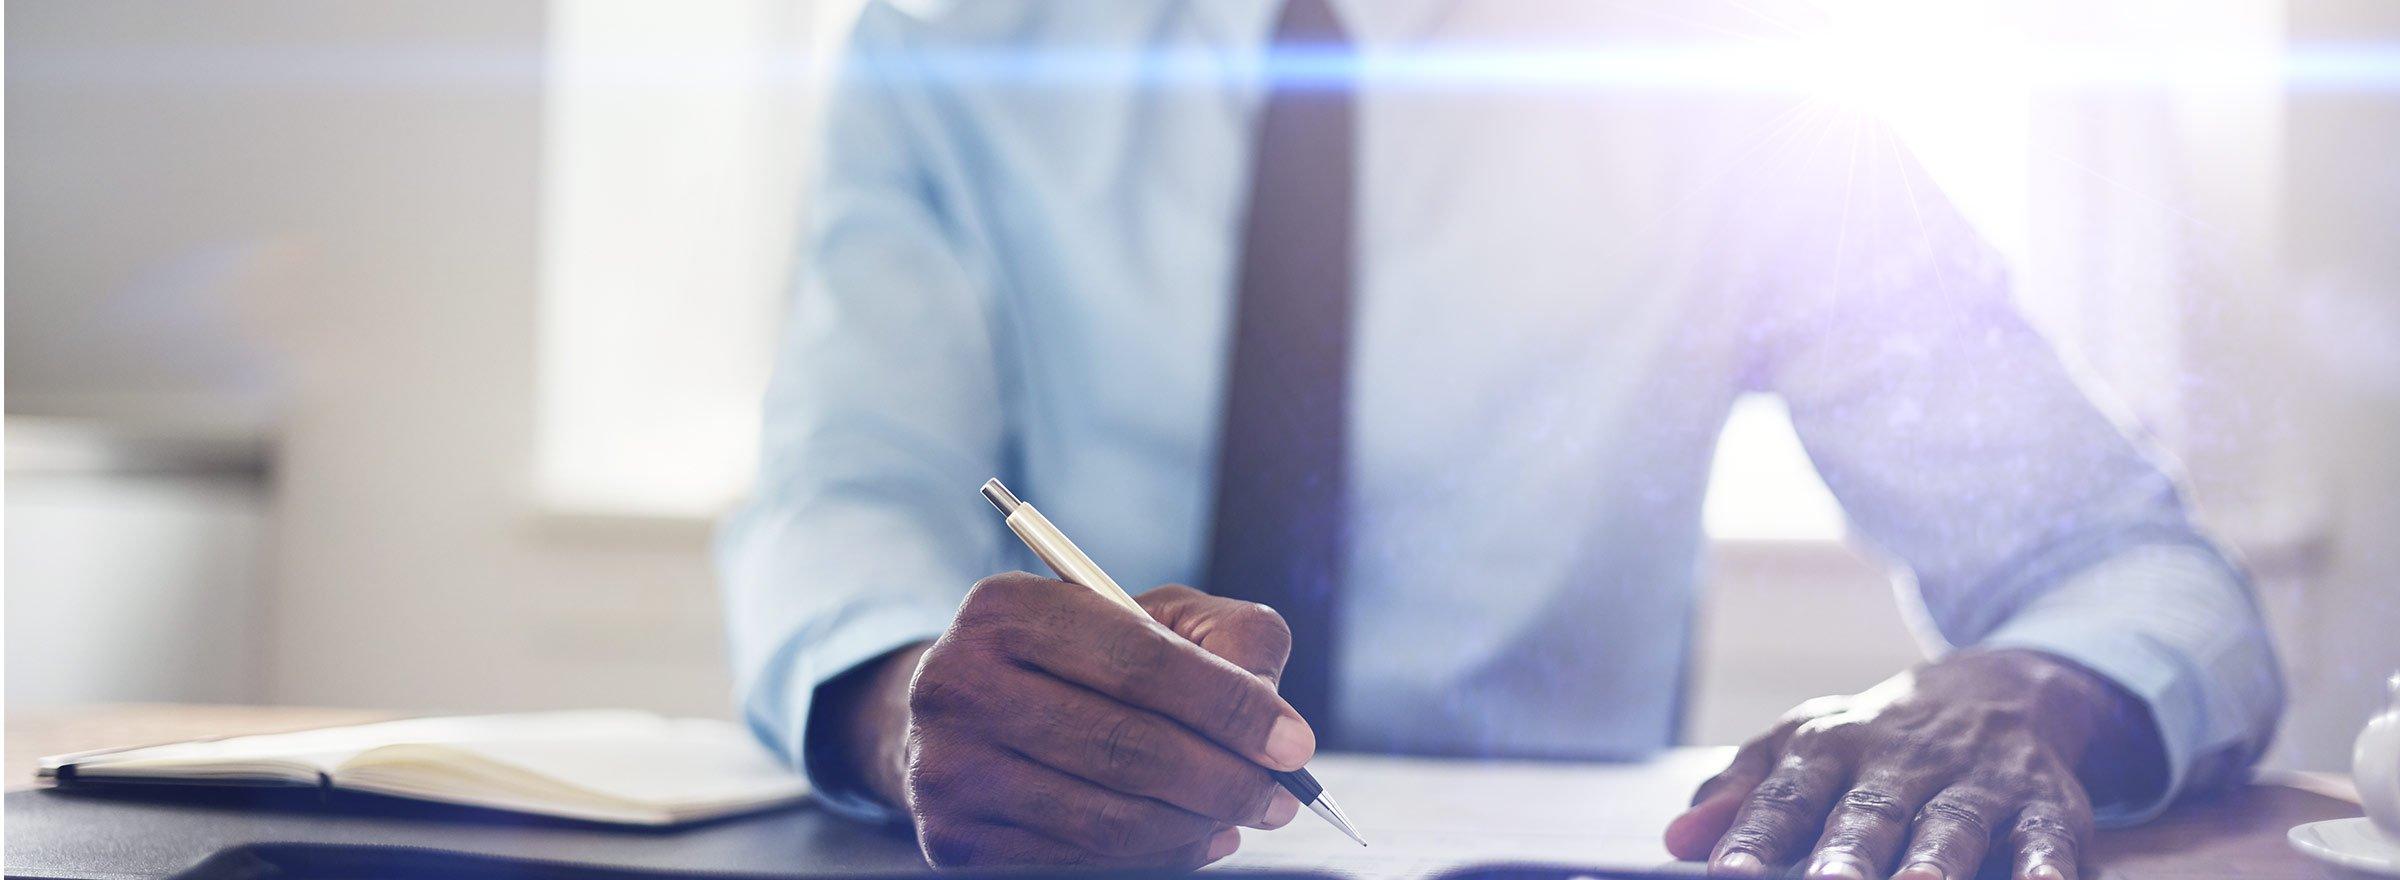 hands of a man holding a pen above a sheet of paper